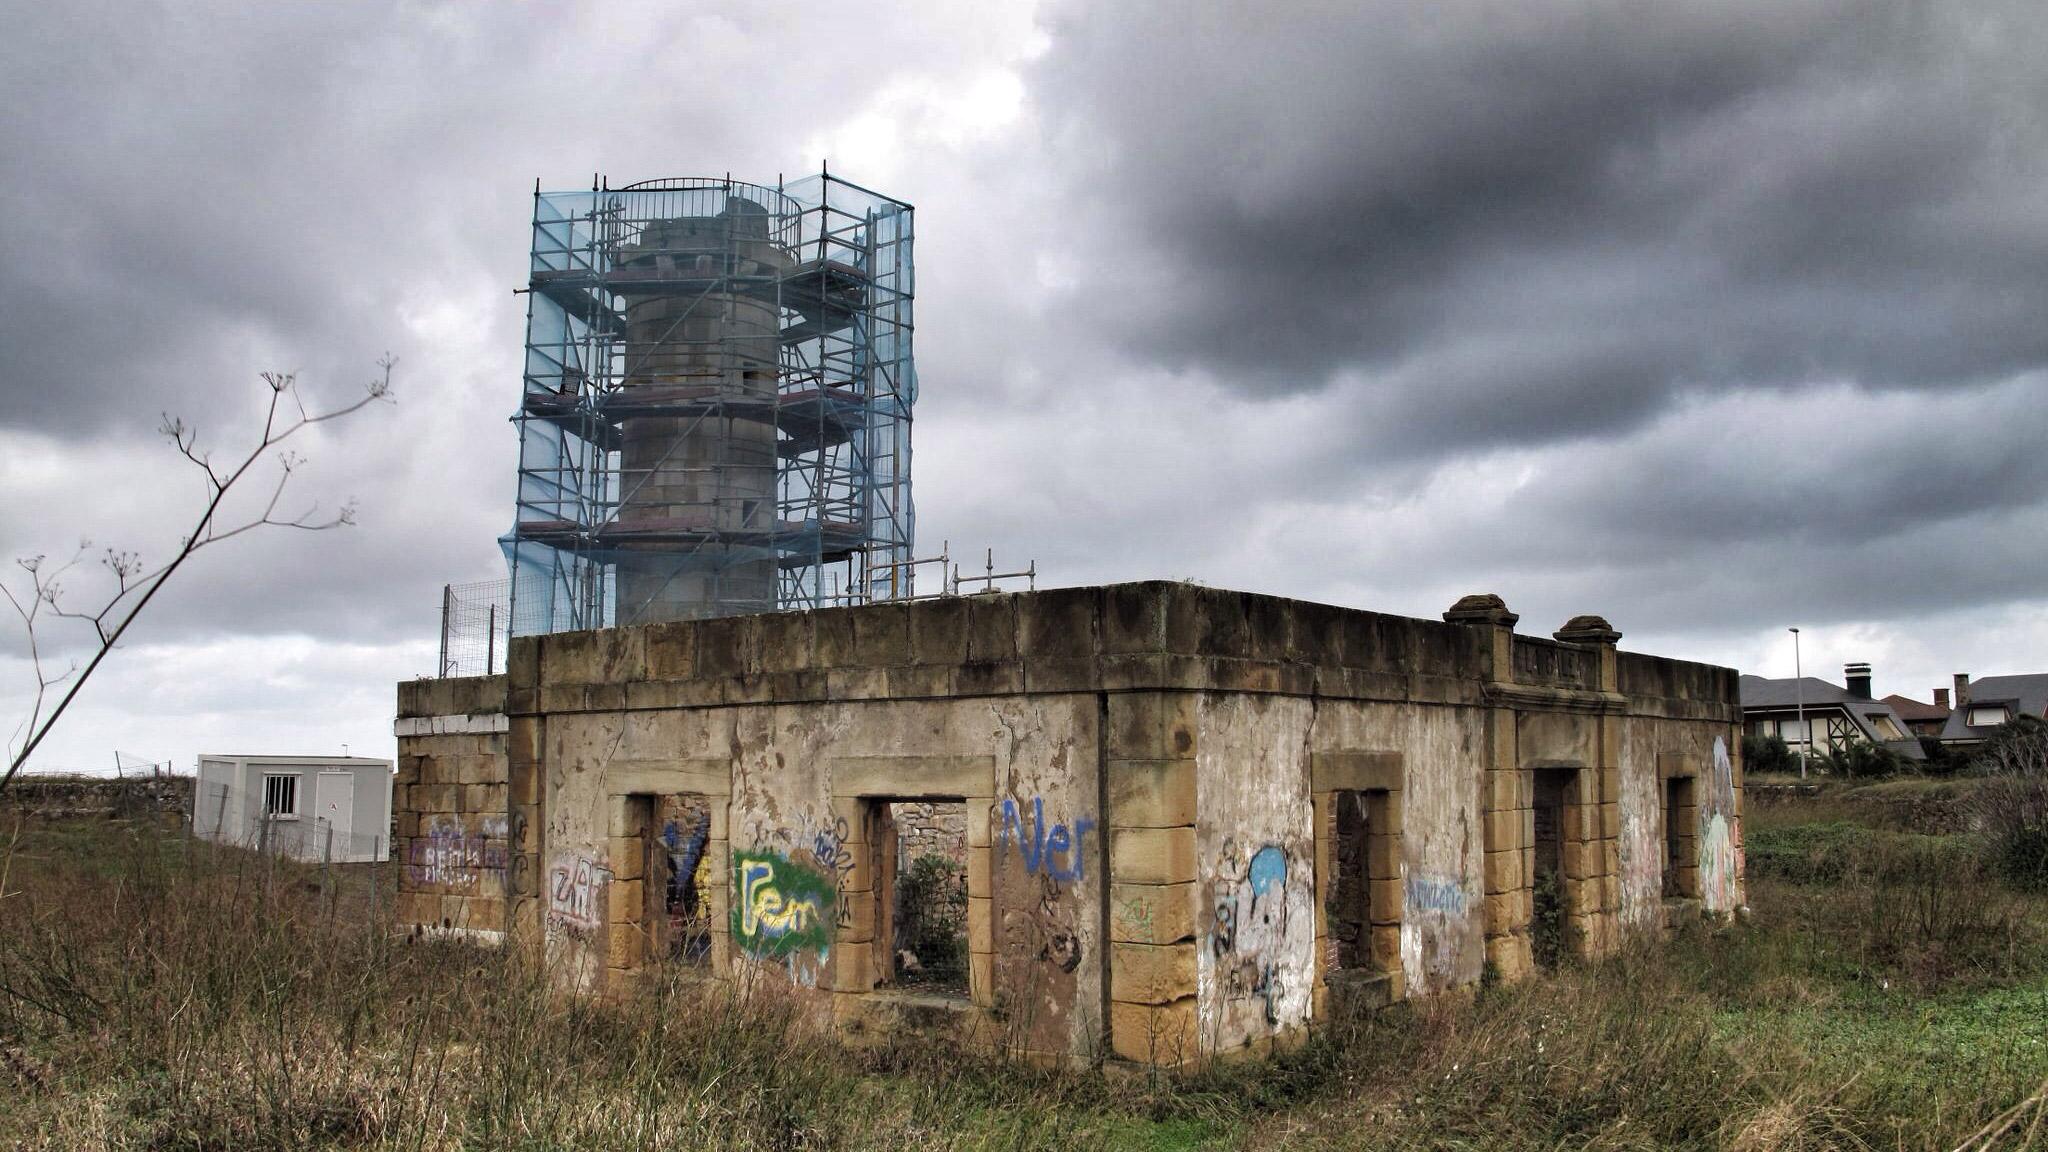 fuerte de la galea_siglo XVIII_restauración_aranzadi_upv ehu